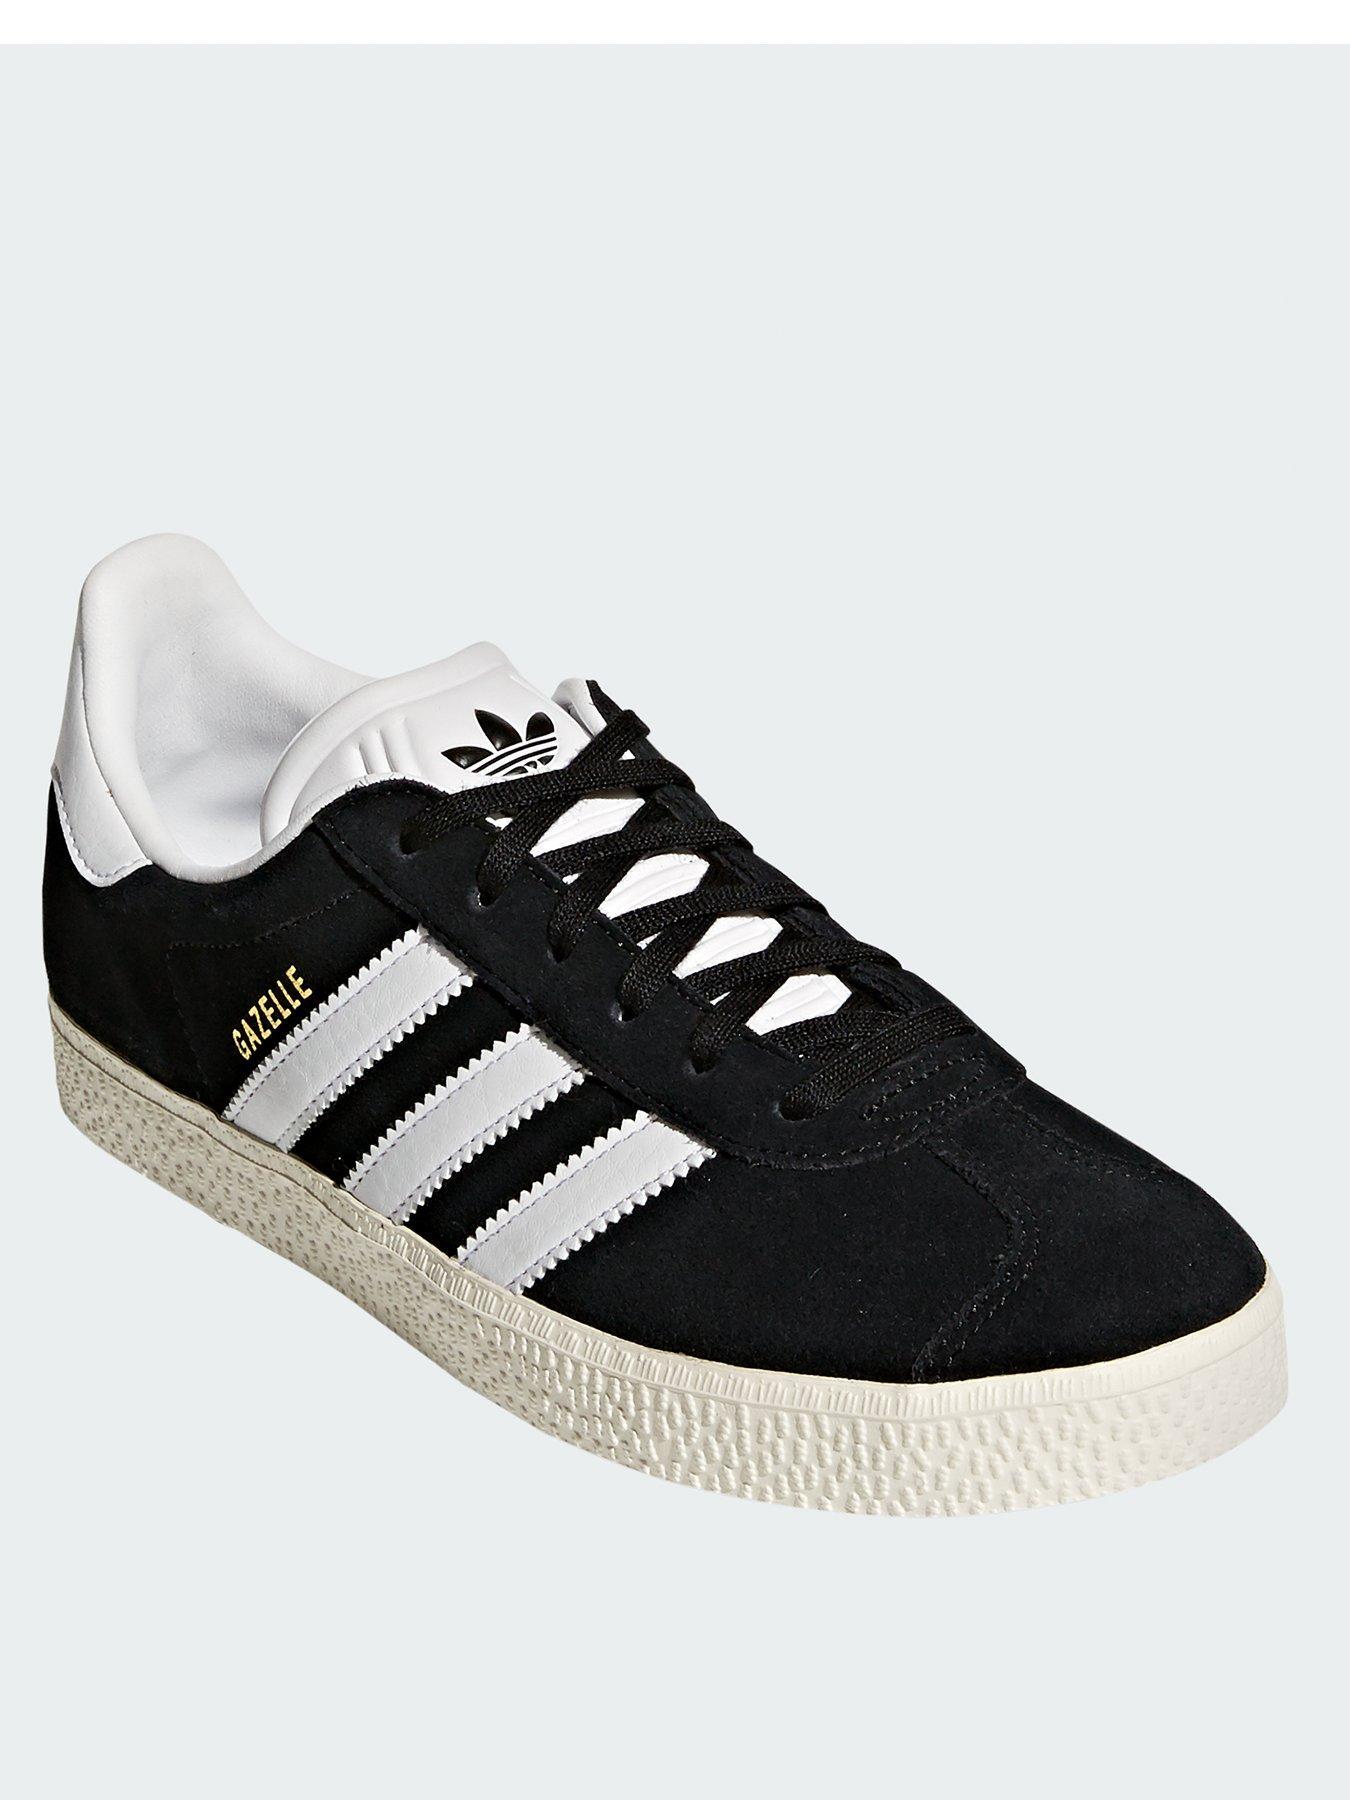 Boy   Adidas   Trainers   Child \u0026 baby